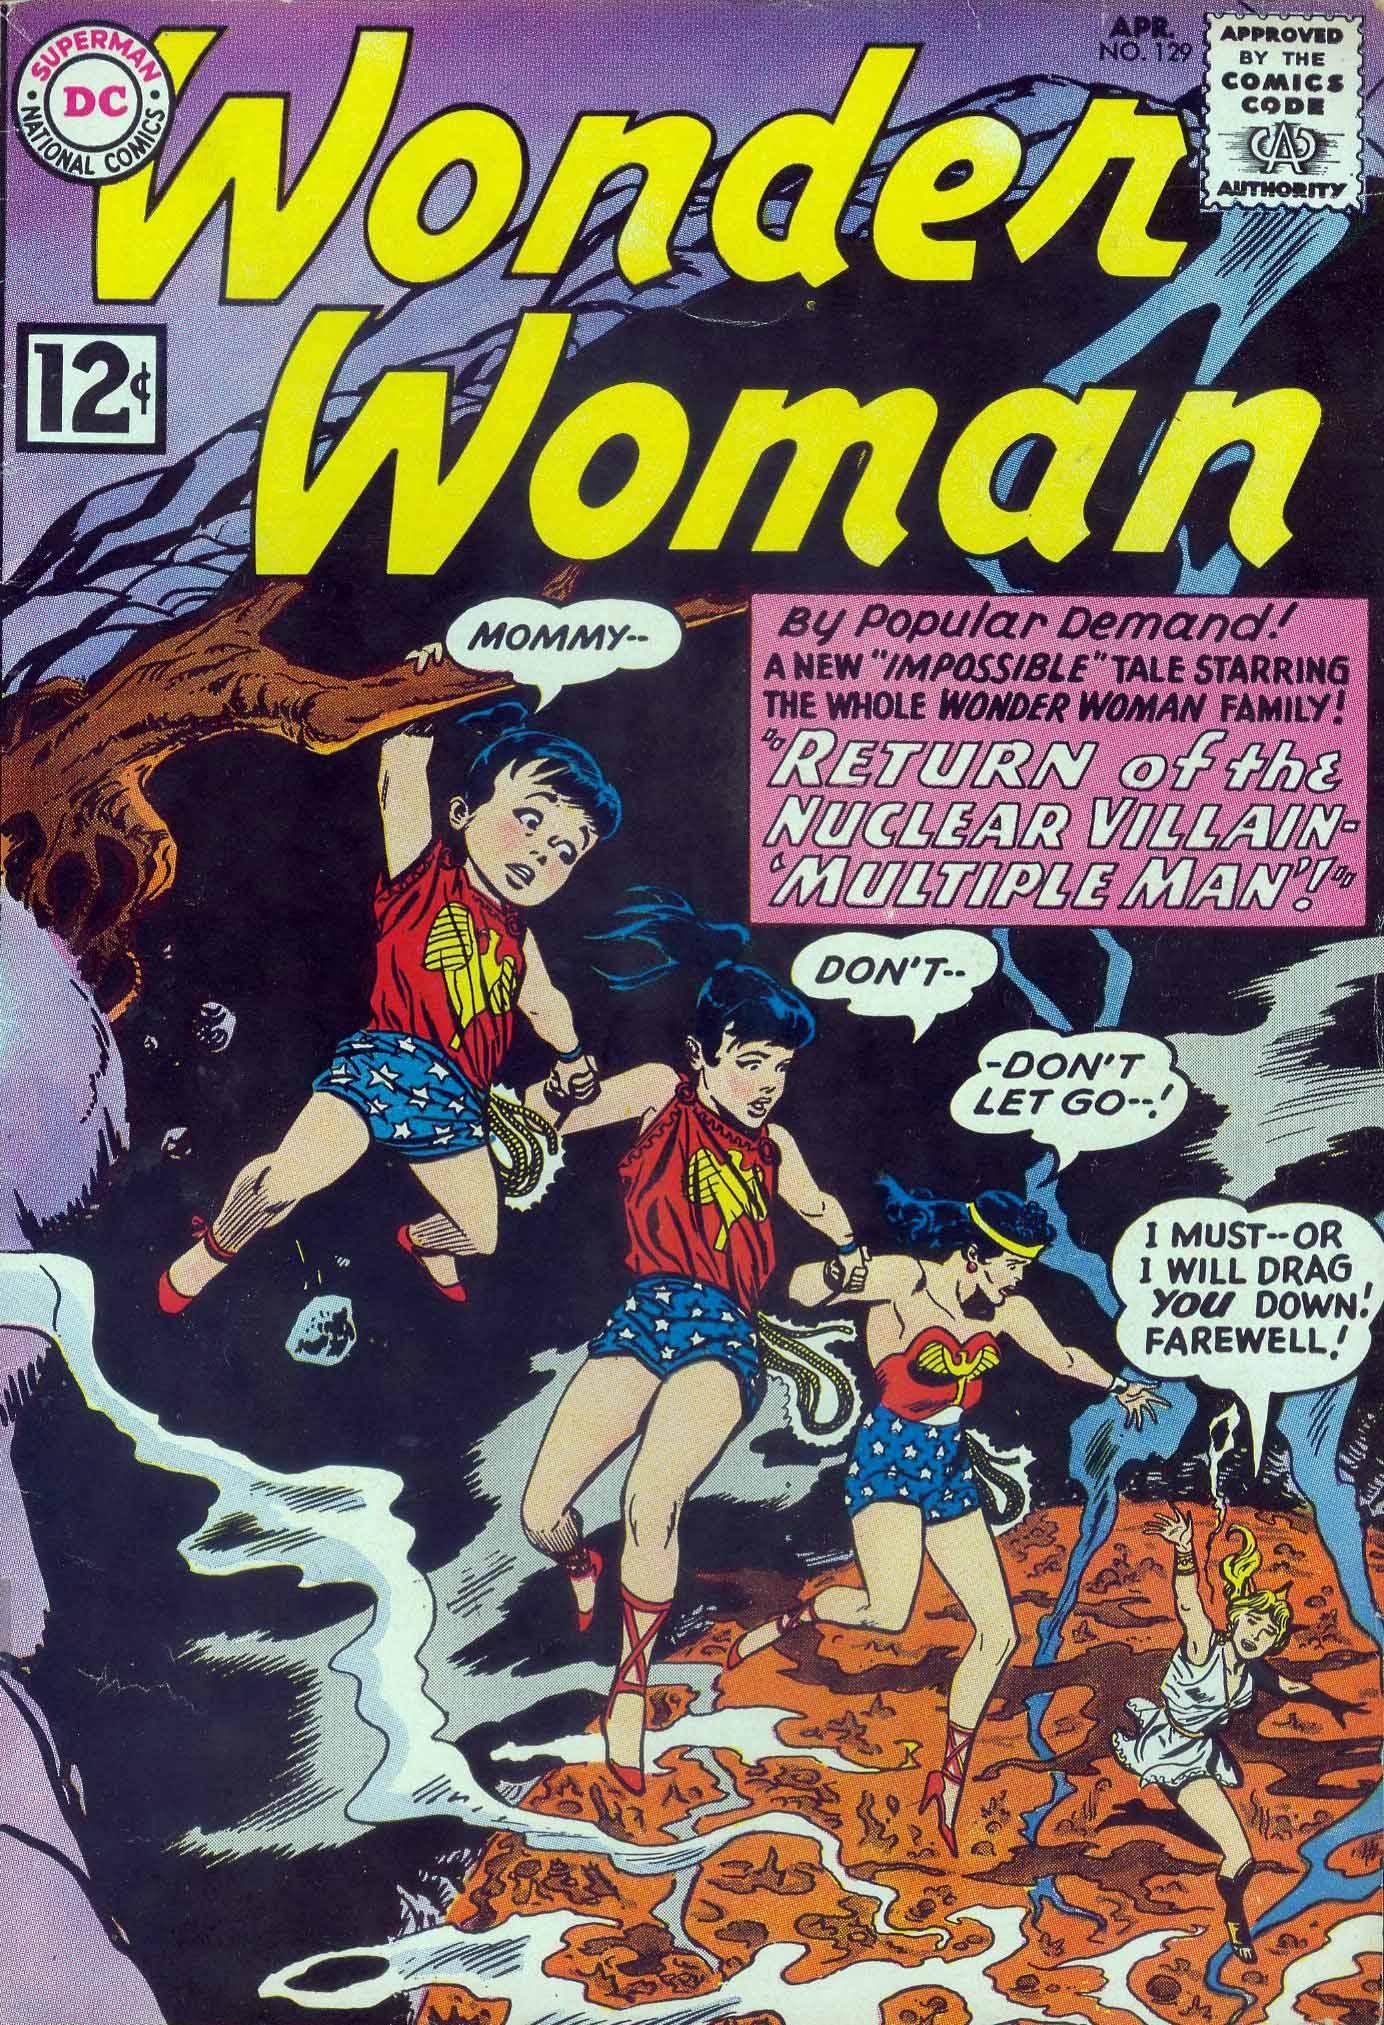 Read online Wonder Woman (1942) comic -  Issue #129 - 1